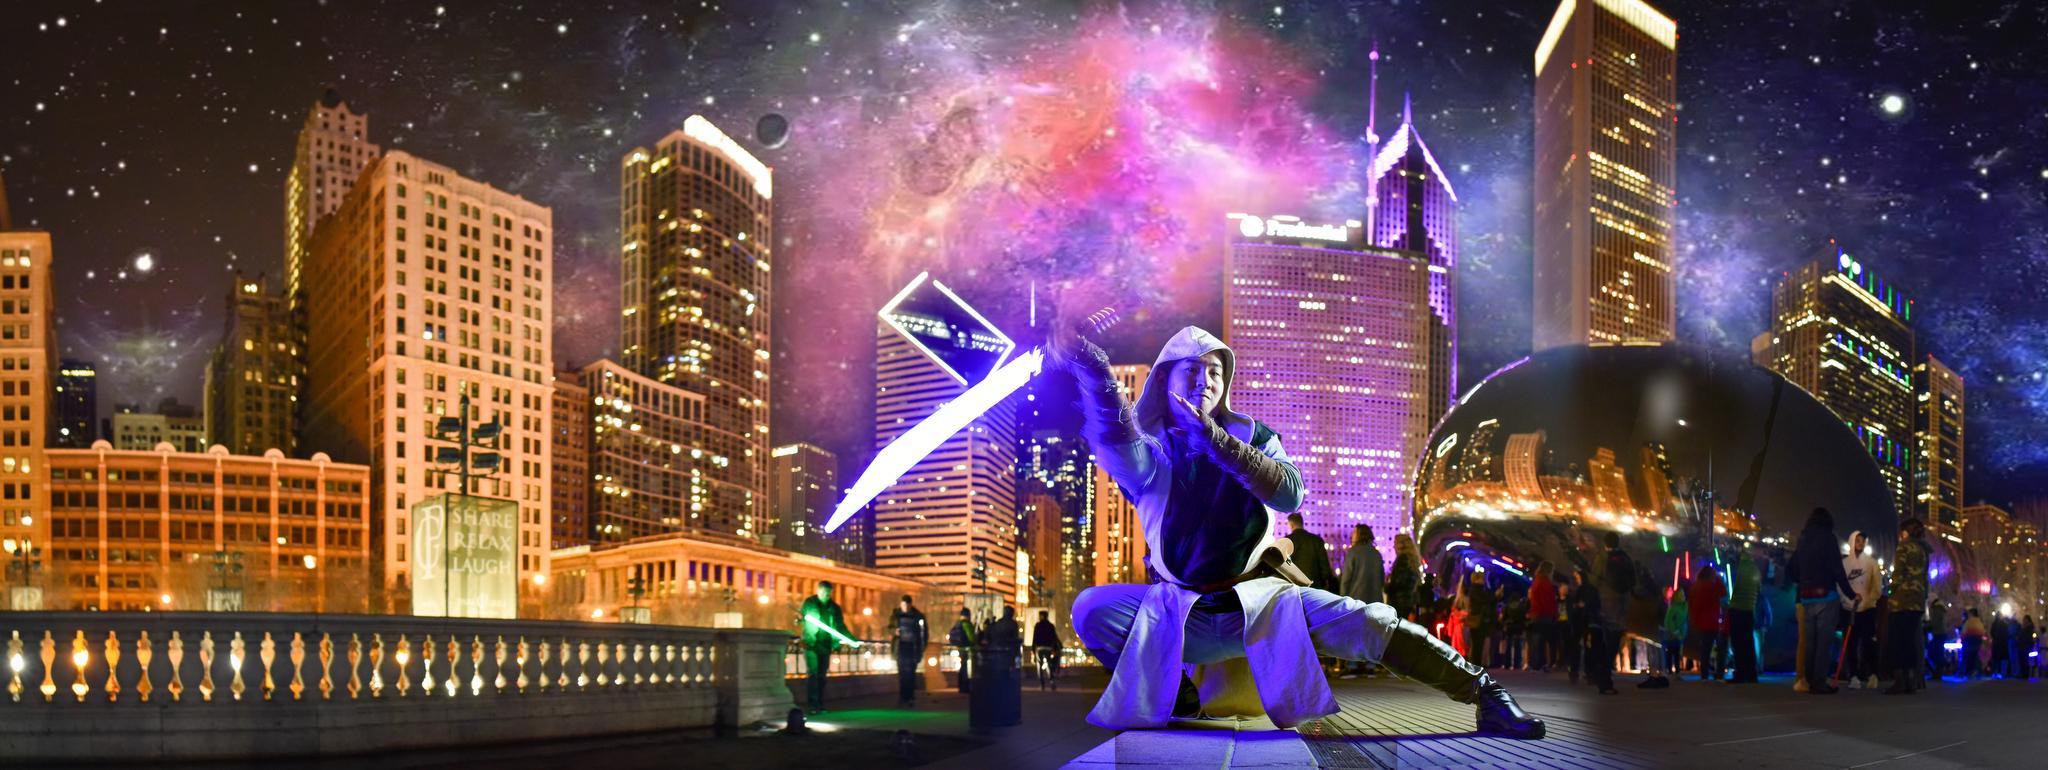 2019.04.14 - Star Wars Celebration Chicago 288845.JPG